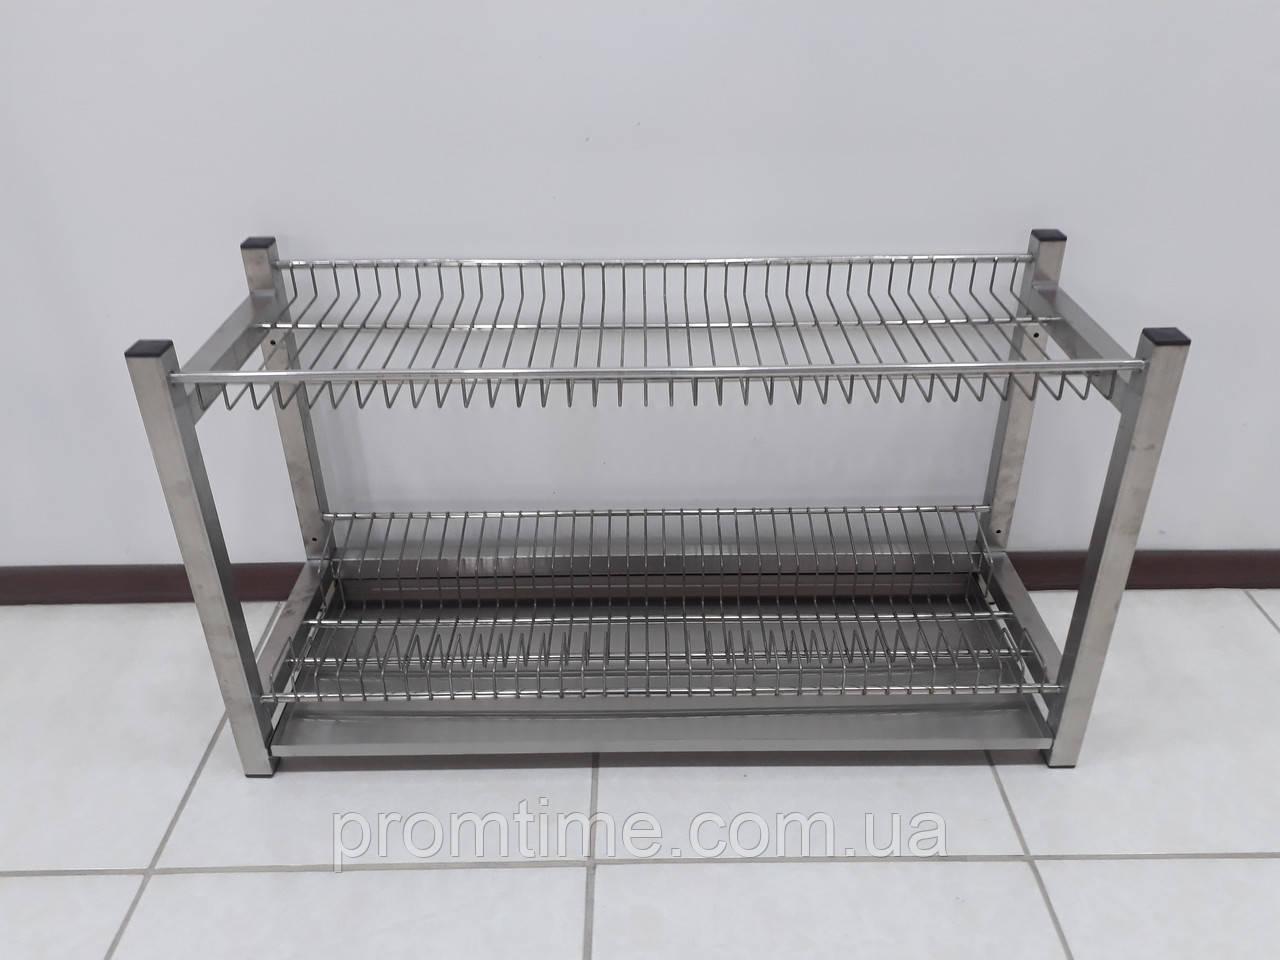 Полка для сушки посуды 1000х320х500